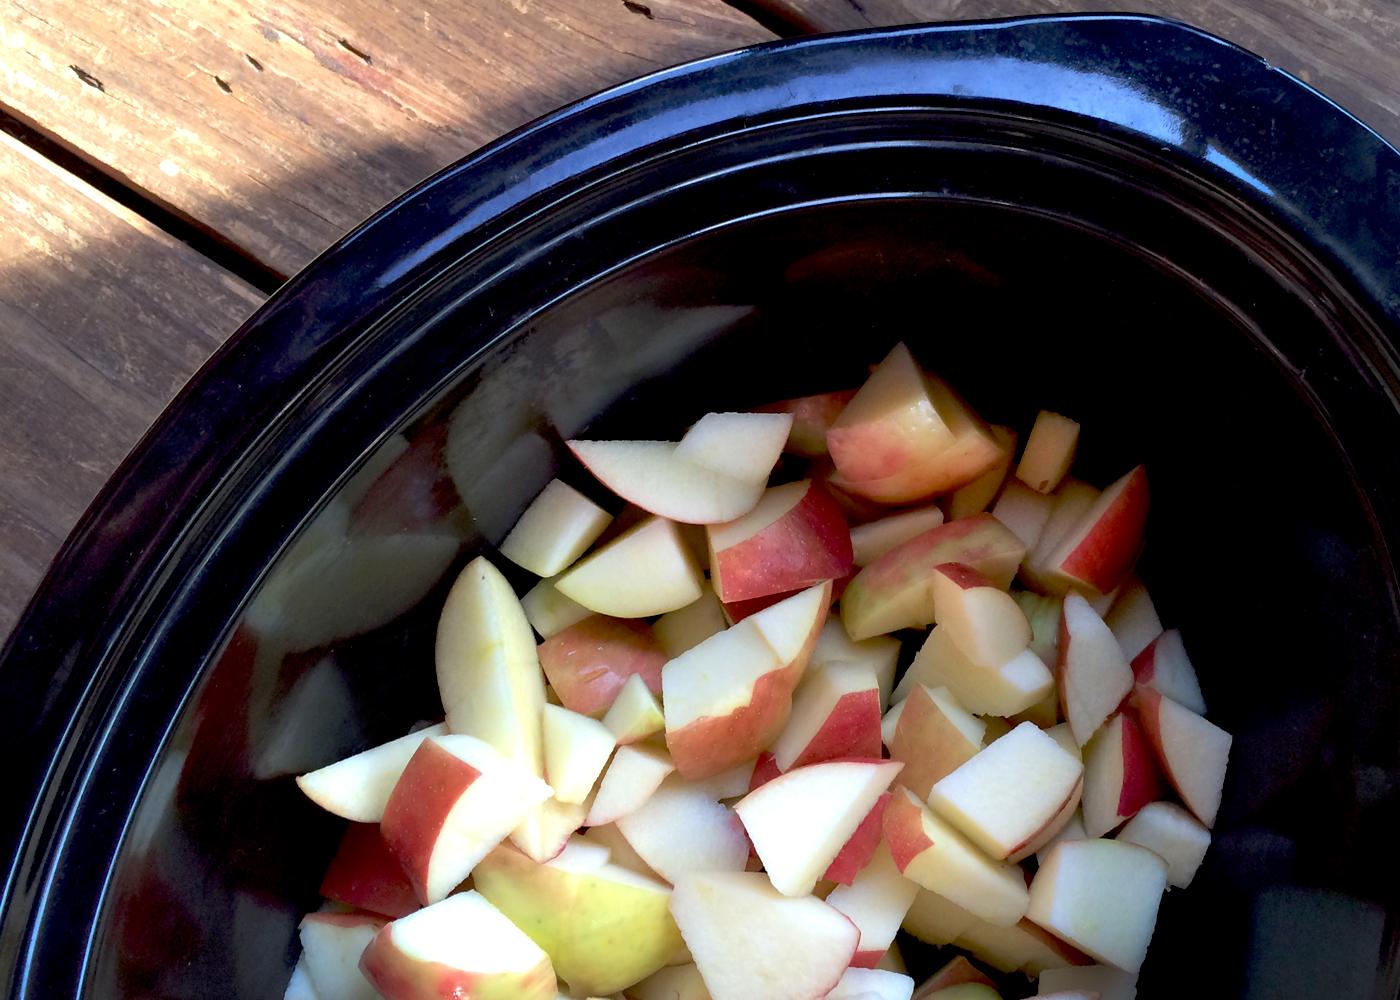 homemade applesauce in the crockpot